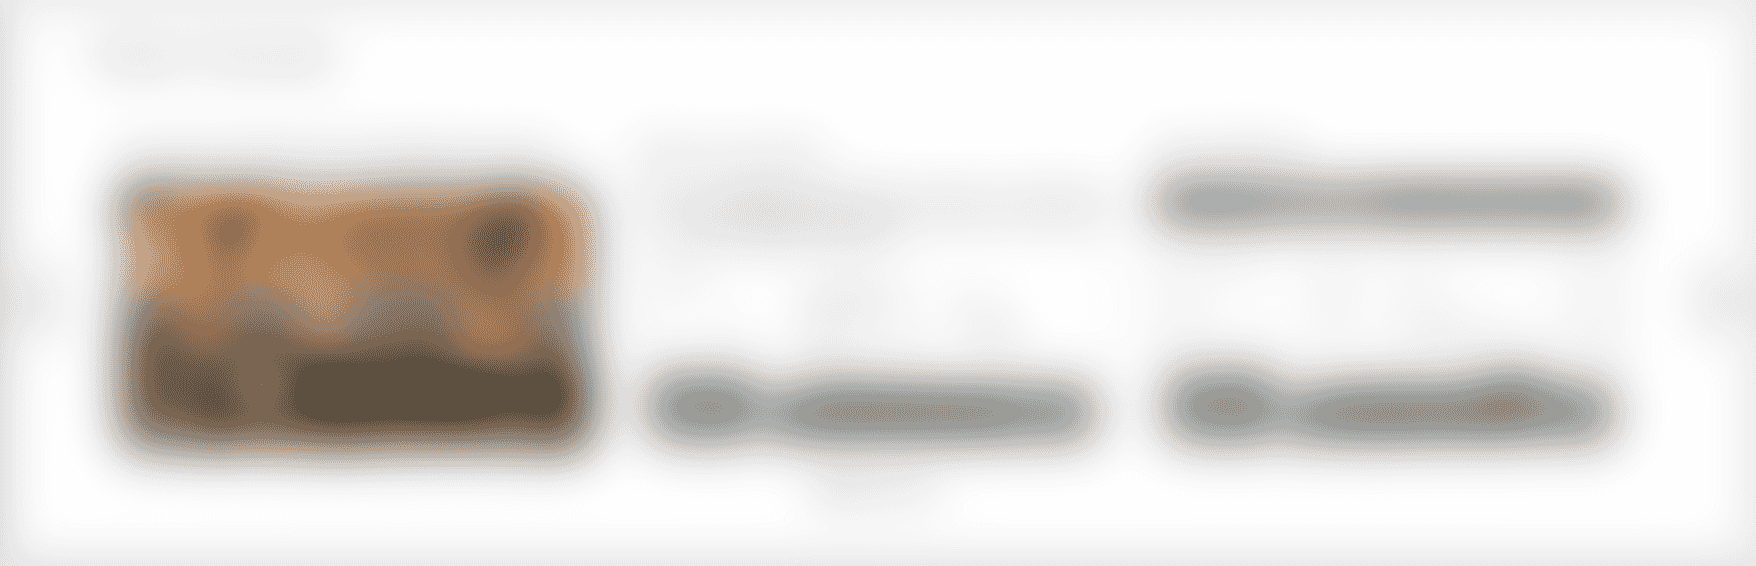 Short-form videos screenshot